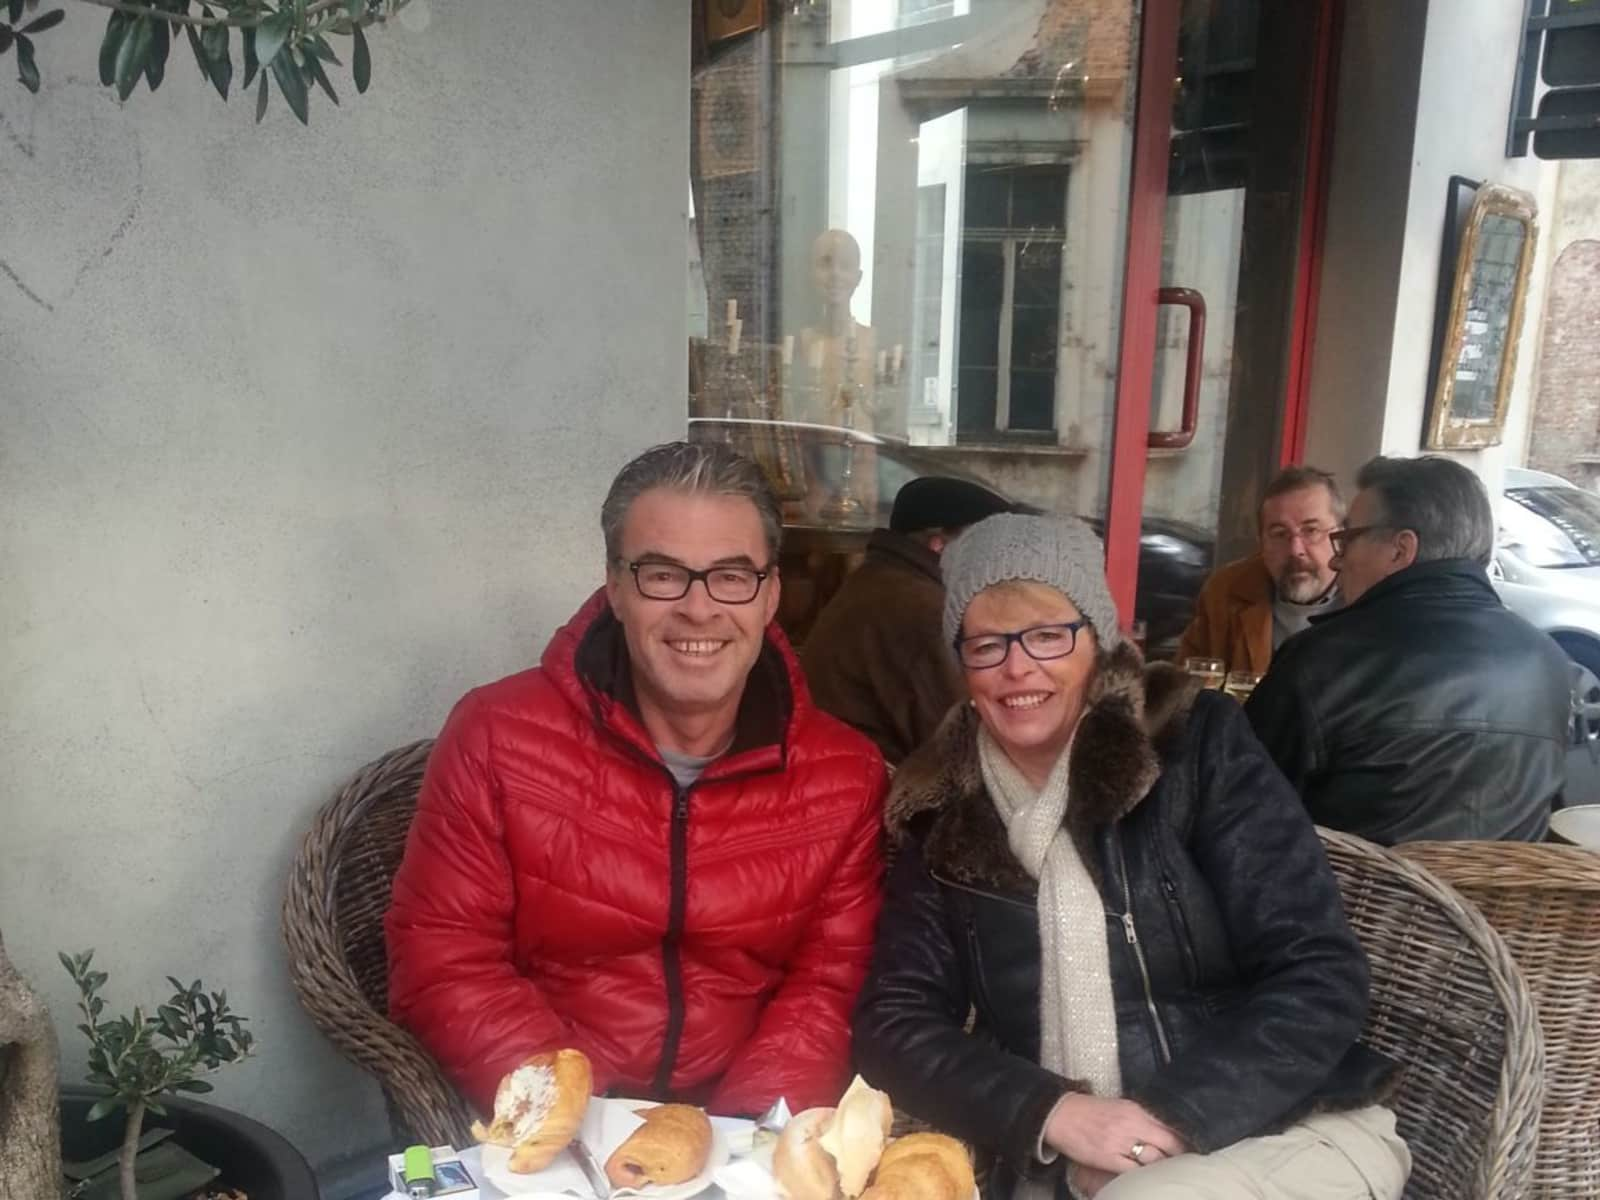 Ronald & Linda from Gent, Belgium